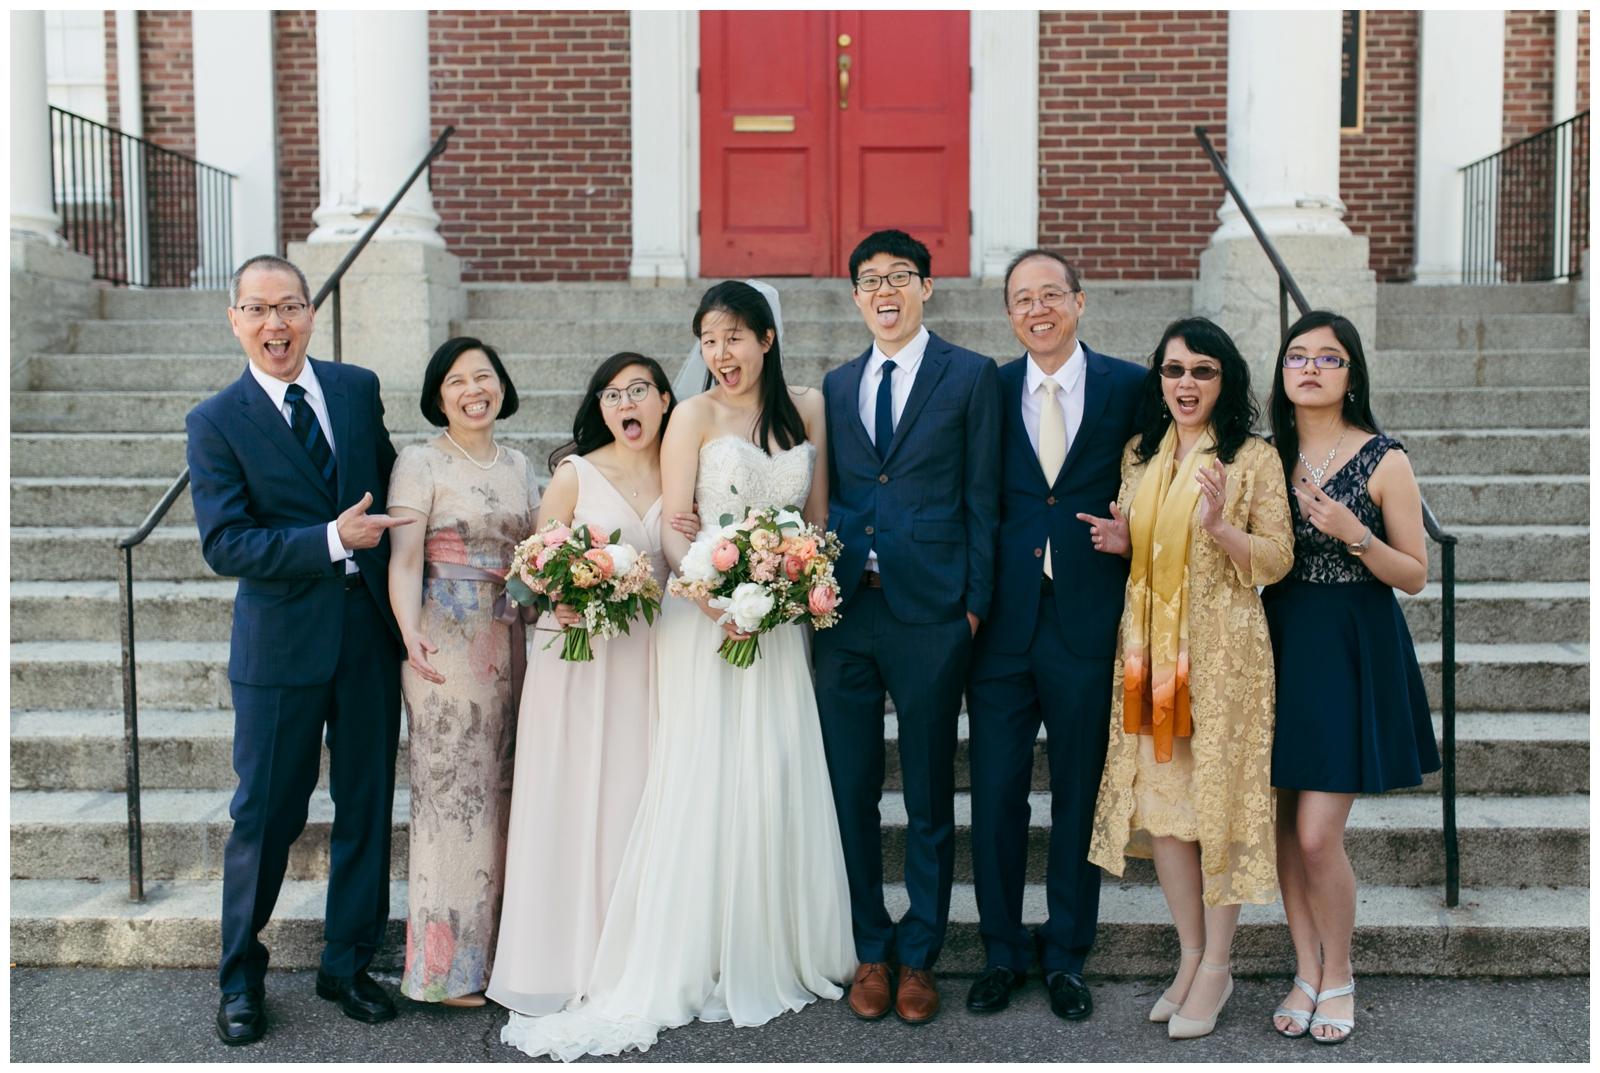 Samberg-Conference-Center-Boston-Wedding-Photographer-Bailey-Q-Photo-071.jpg